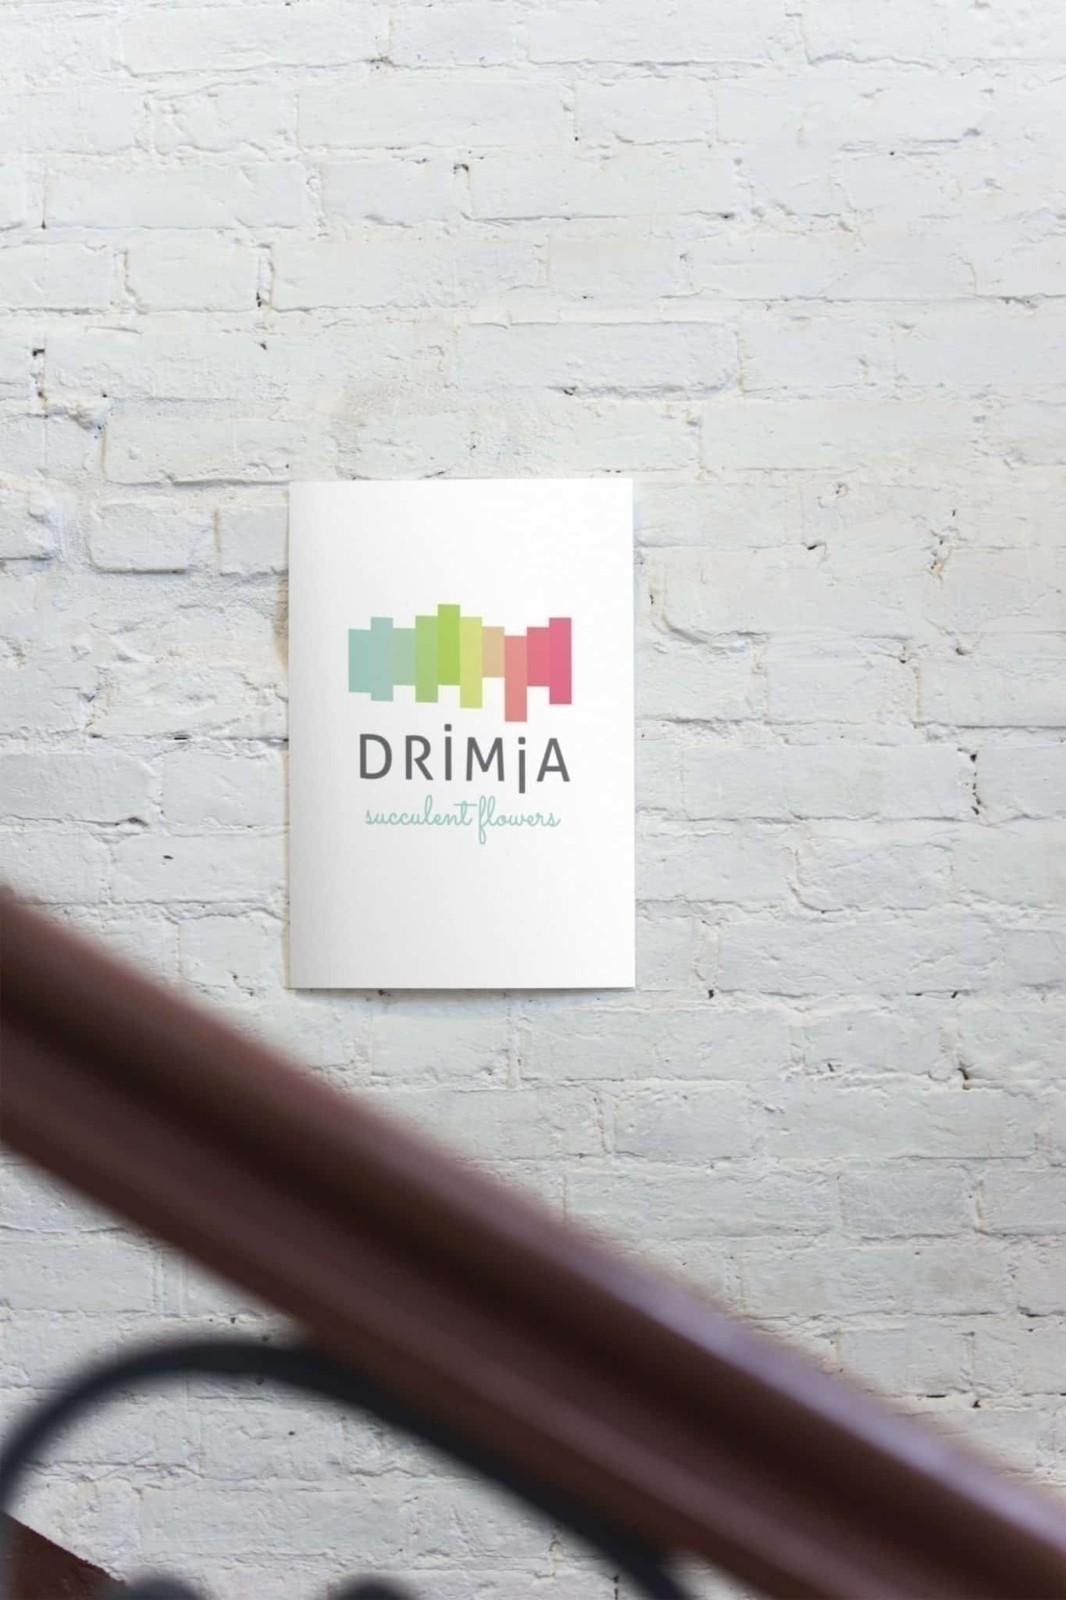 Drimia,